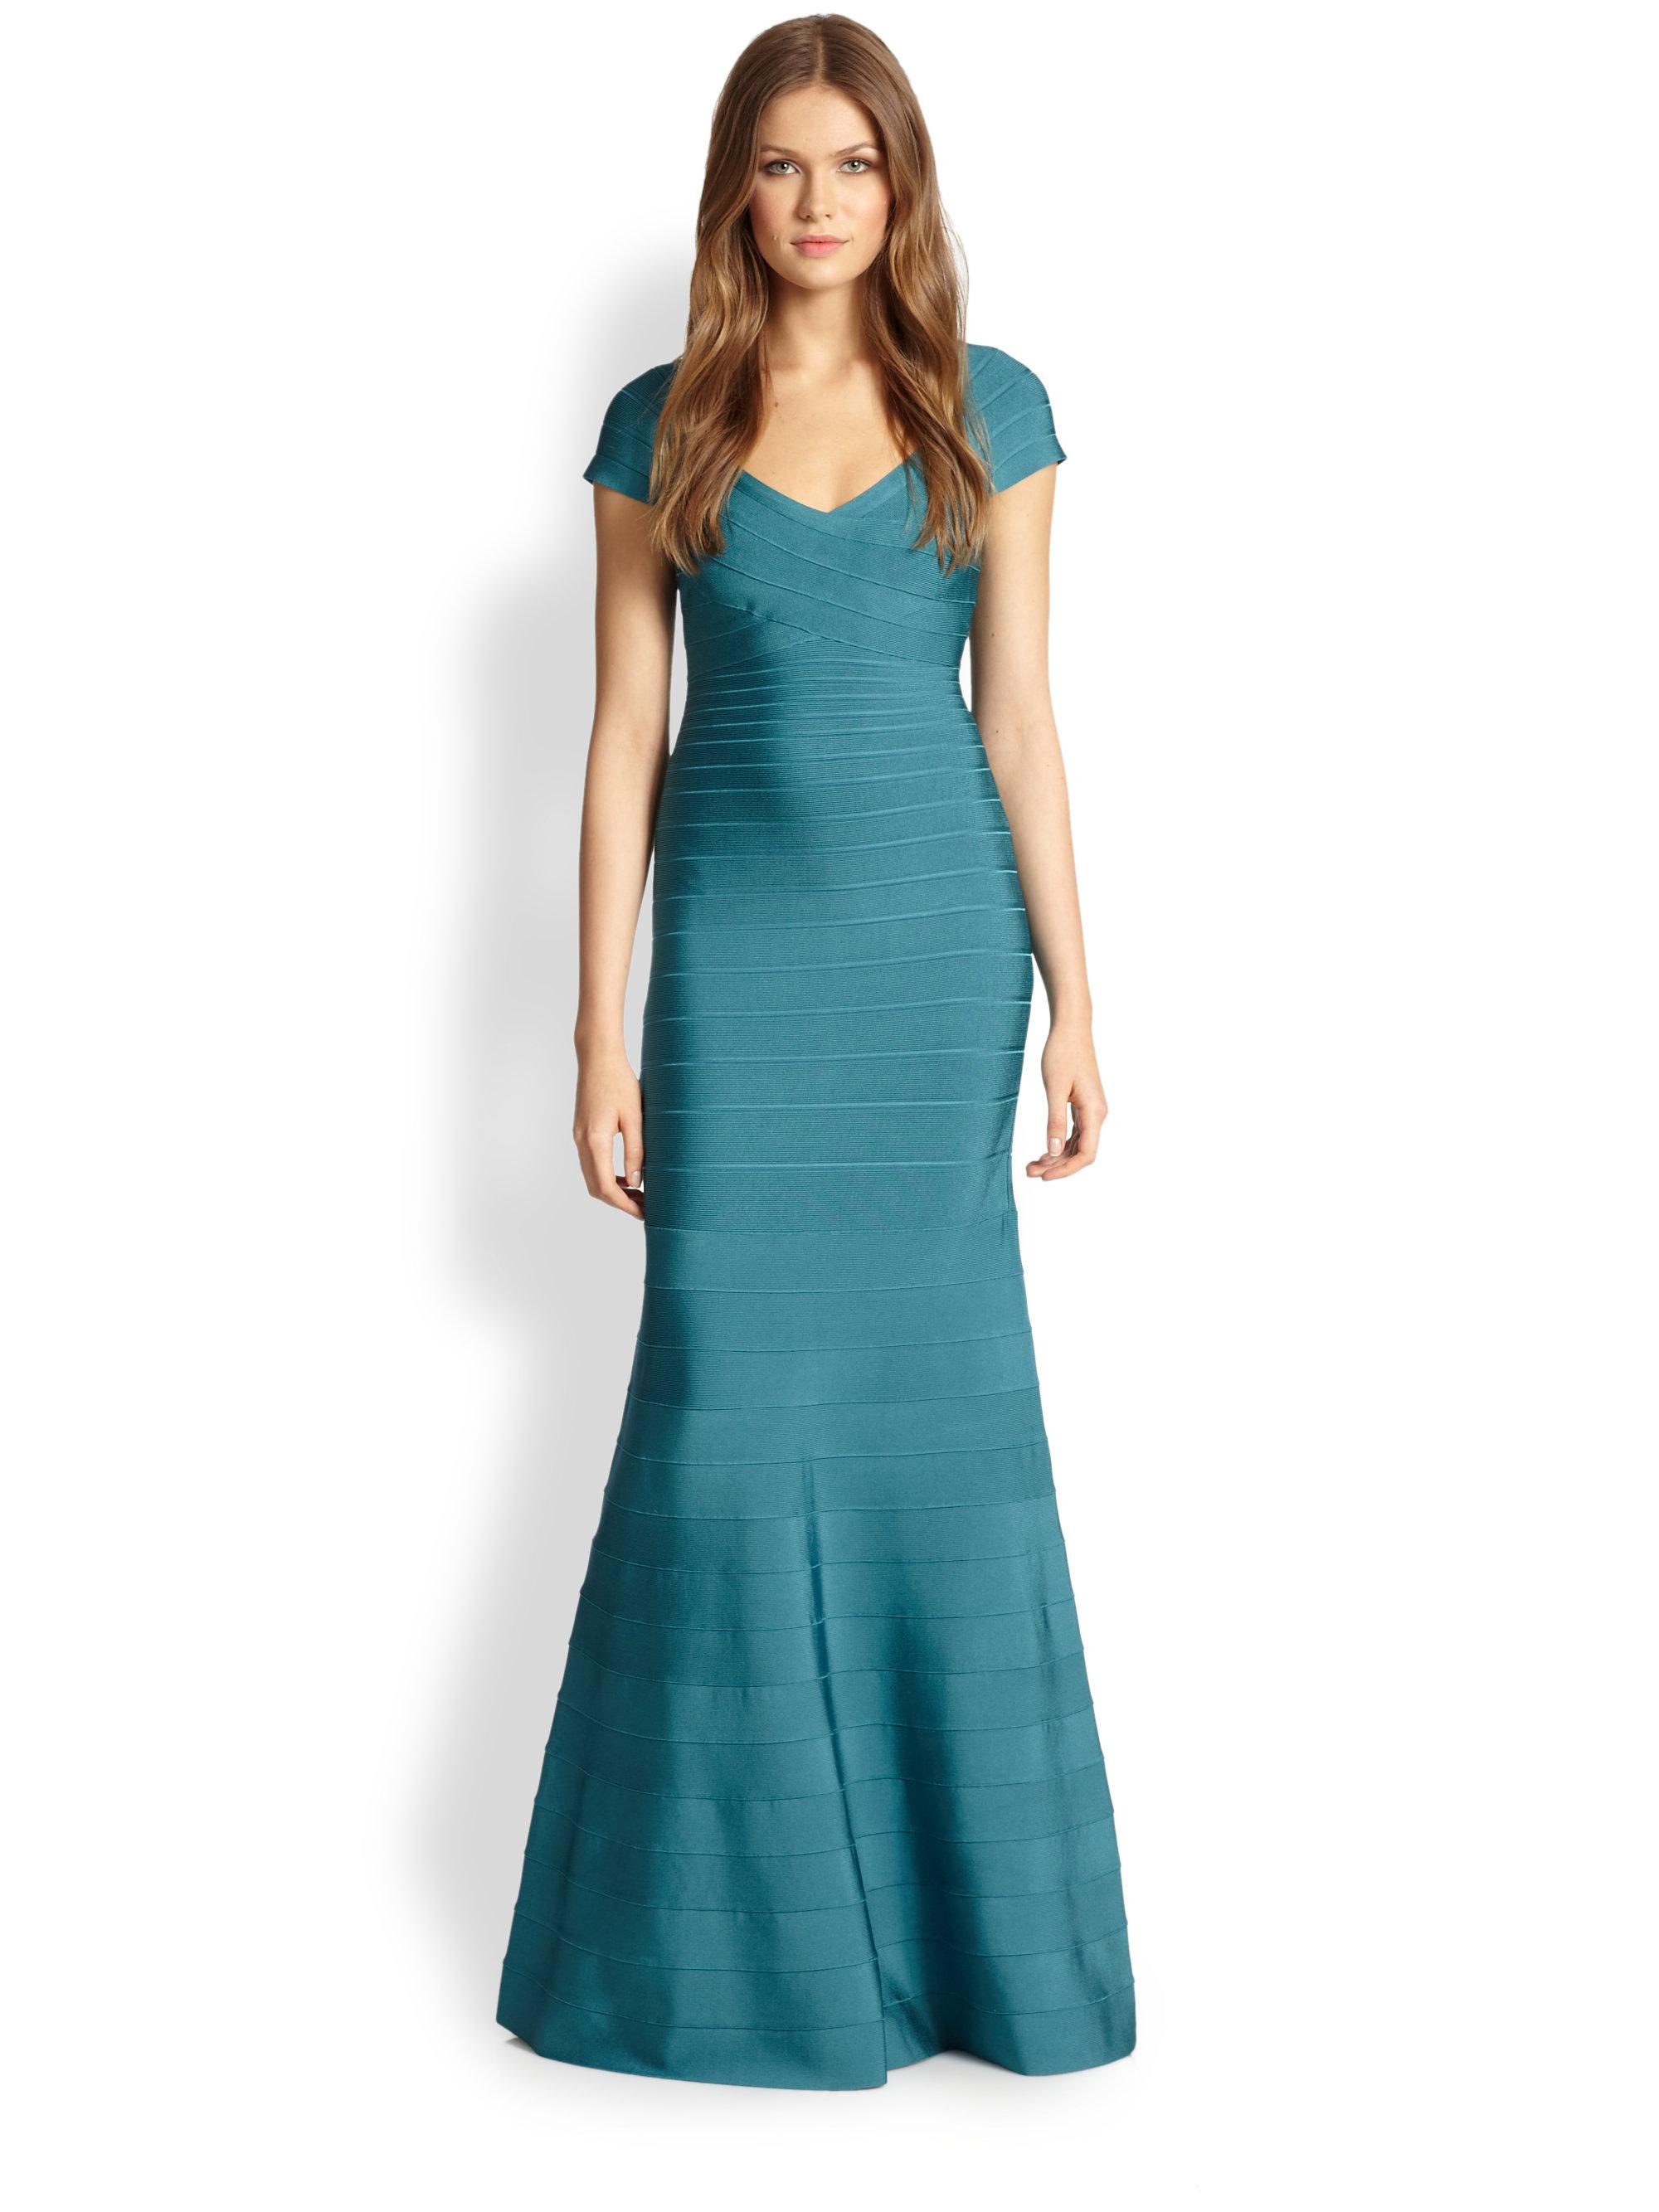 67922ab7668bc Hervé Léger Cap-Sleeve Bandage Mermaid Gown in Blue - Lyst